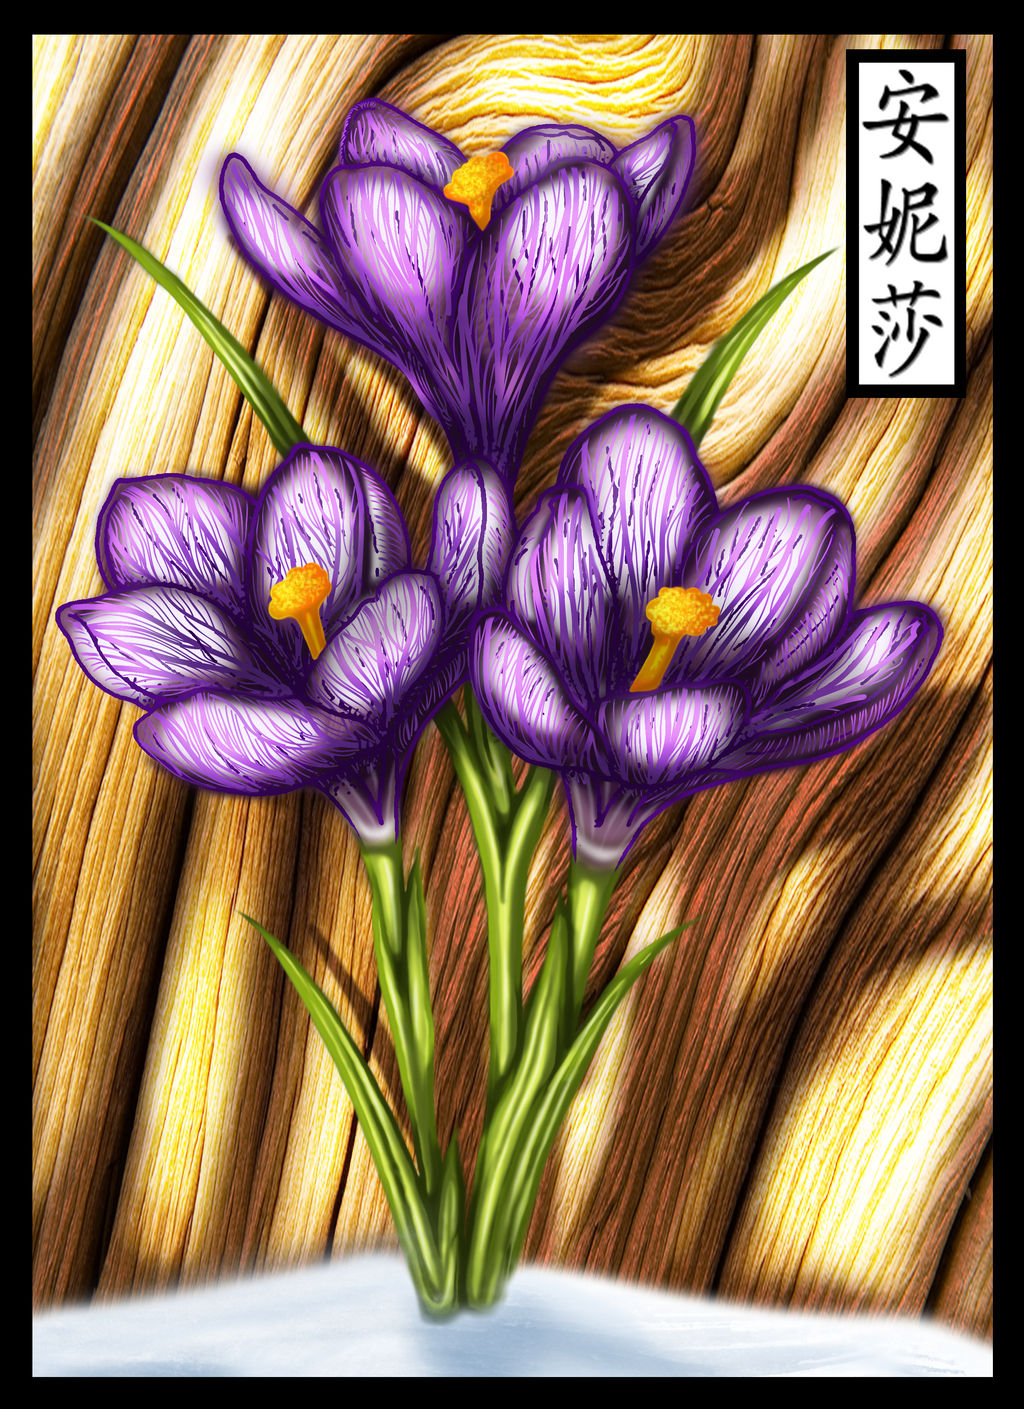 Super Coloring's Garden Crocus - Done